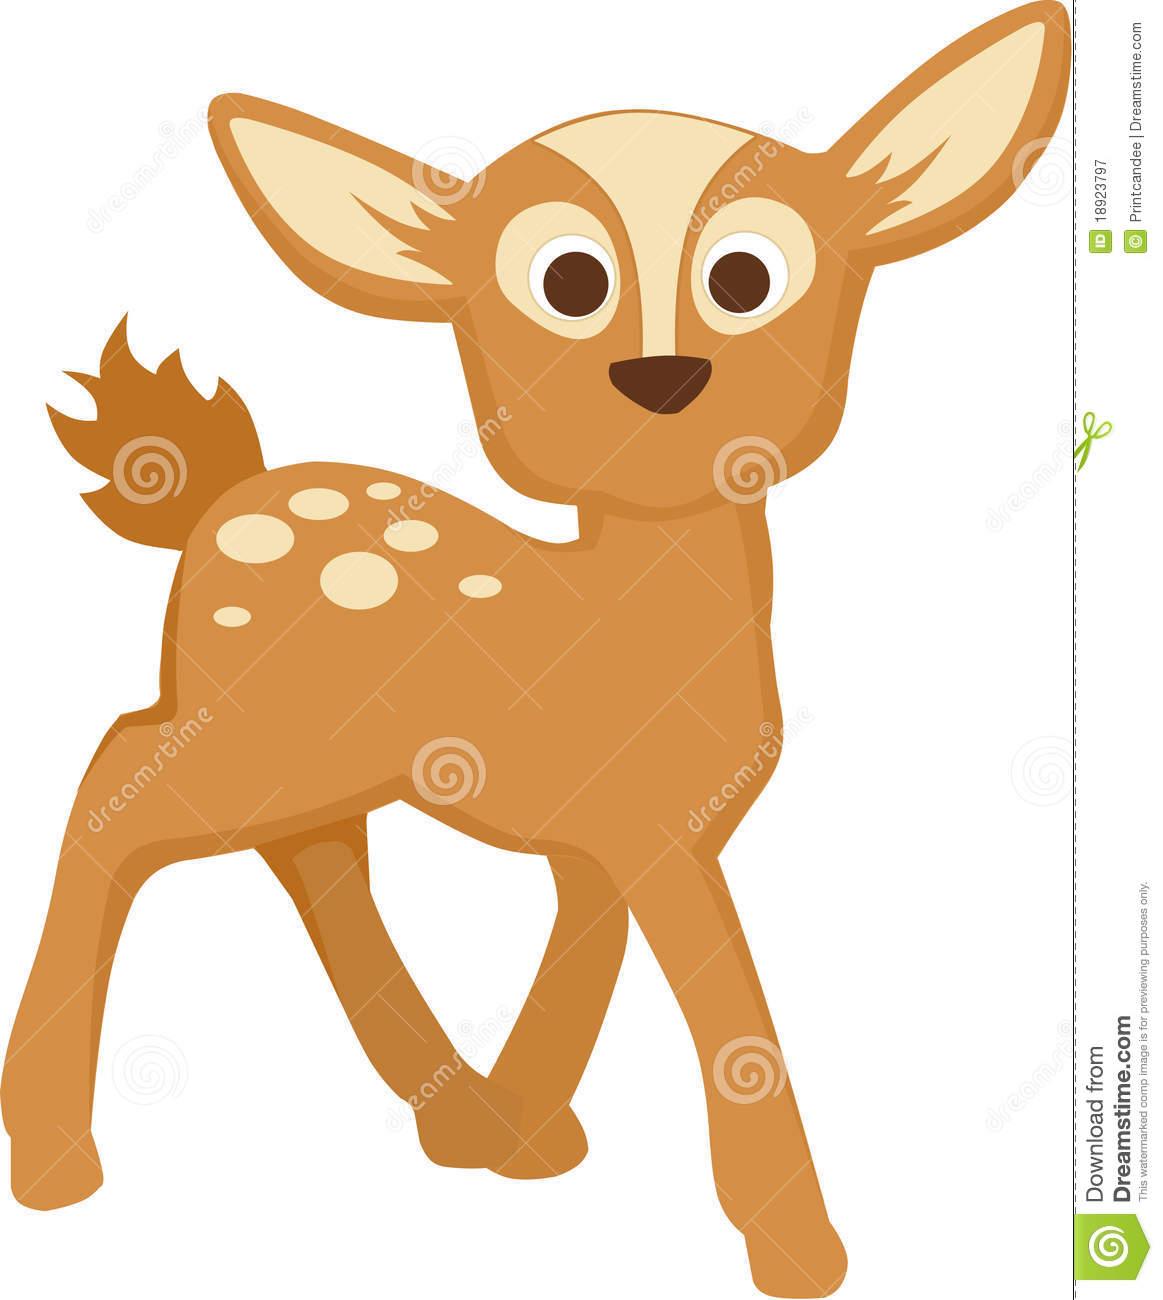 Cute Baby Deer Clipart - Clipart Kid